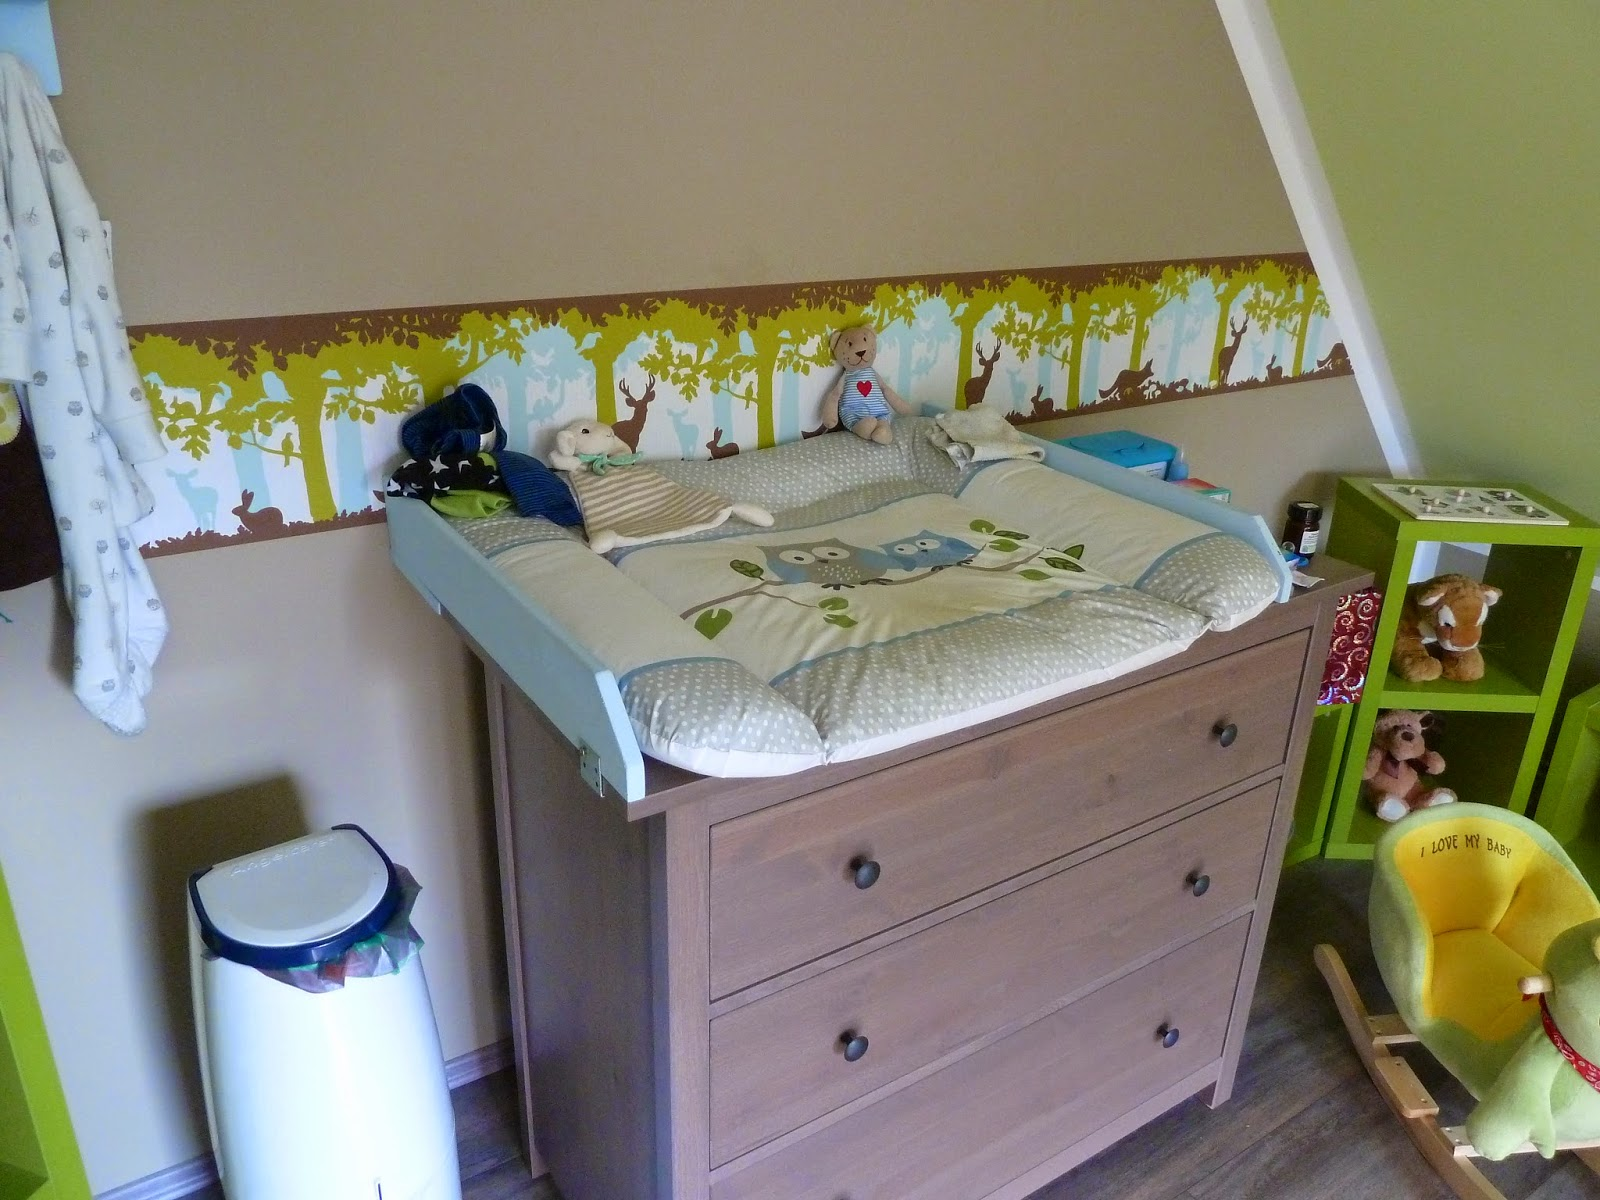 mutterfreu n de so wohnt kilian. Black Bedroom Furniture Sets. Home Design Ideas